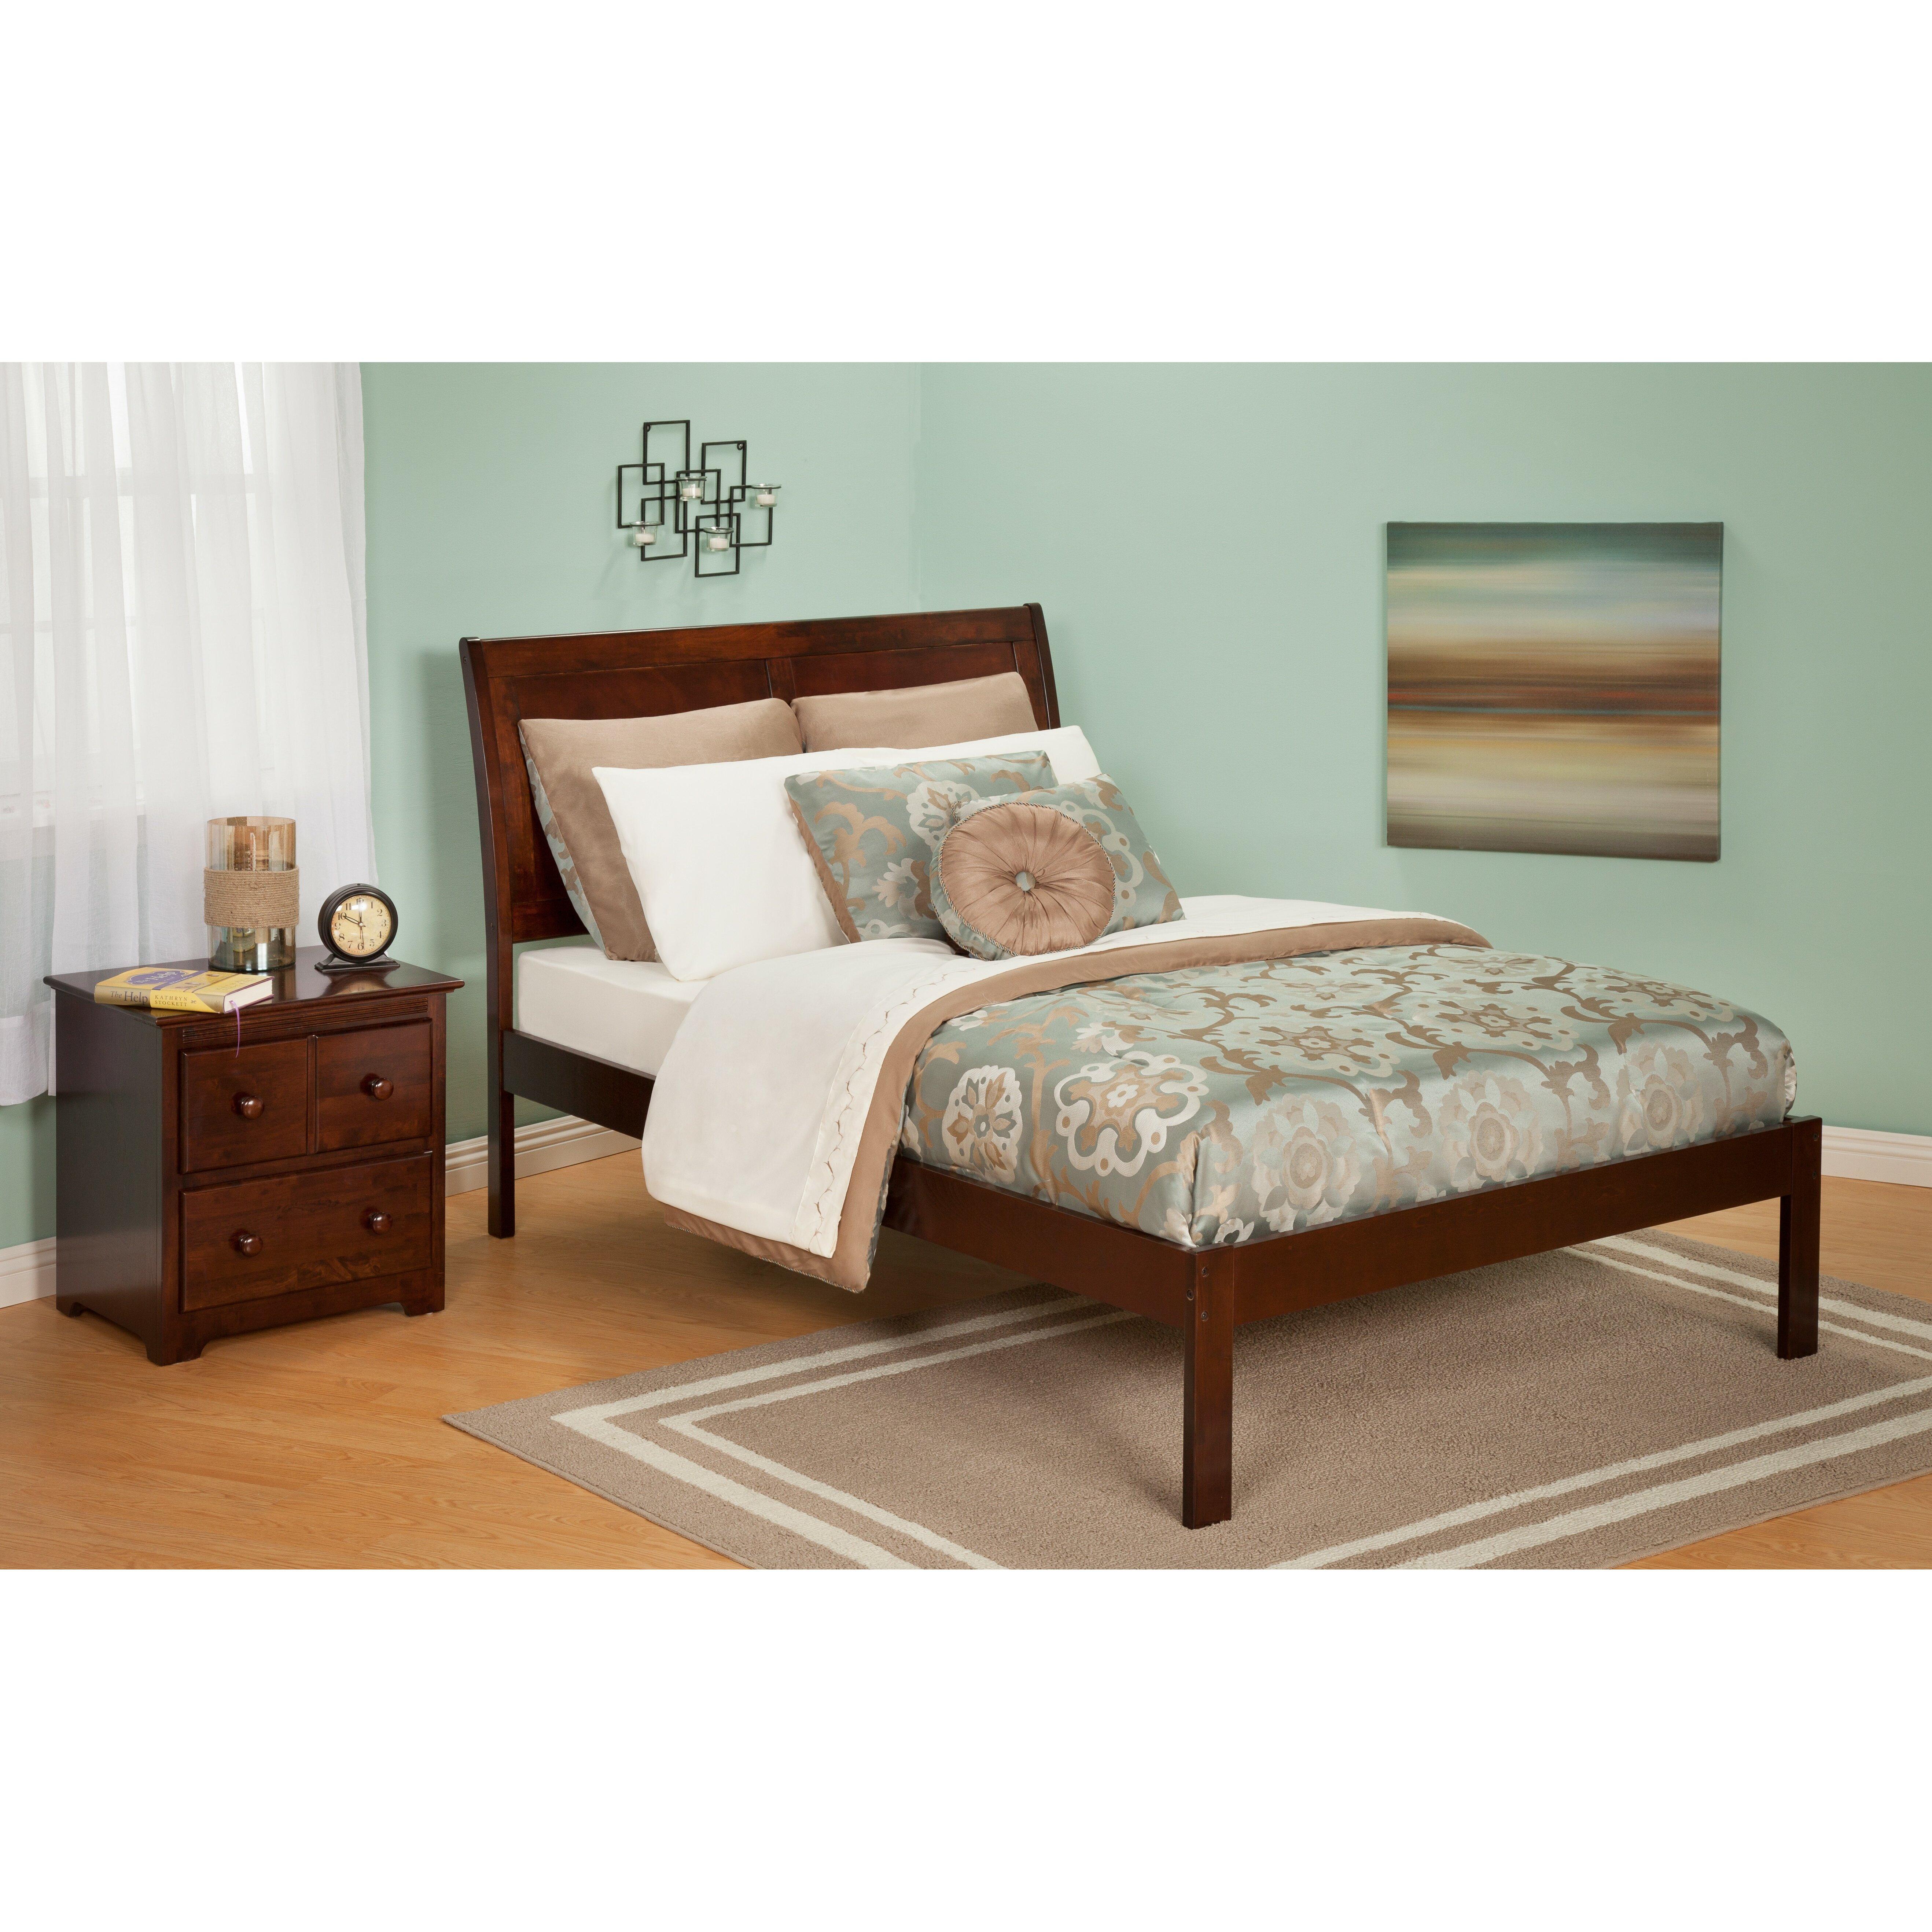 Washington twin over full bunk bed with trundle amp reviews wayfair - Atlantic Furniture Wayfair